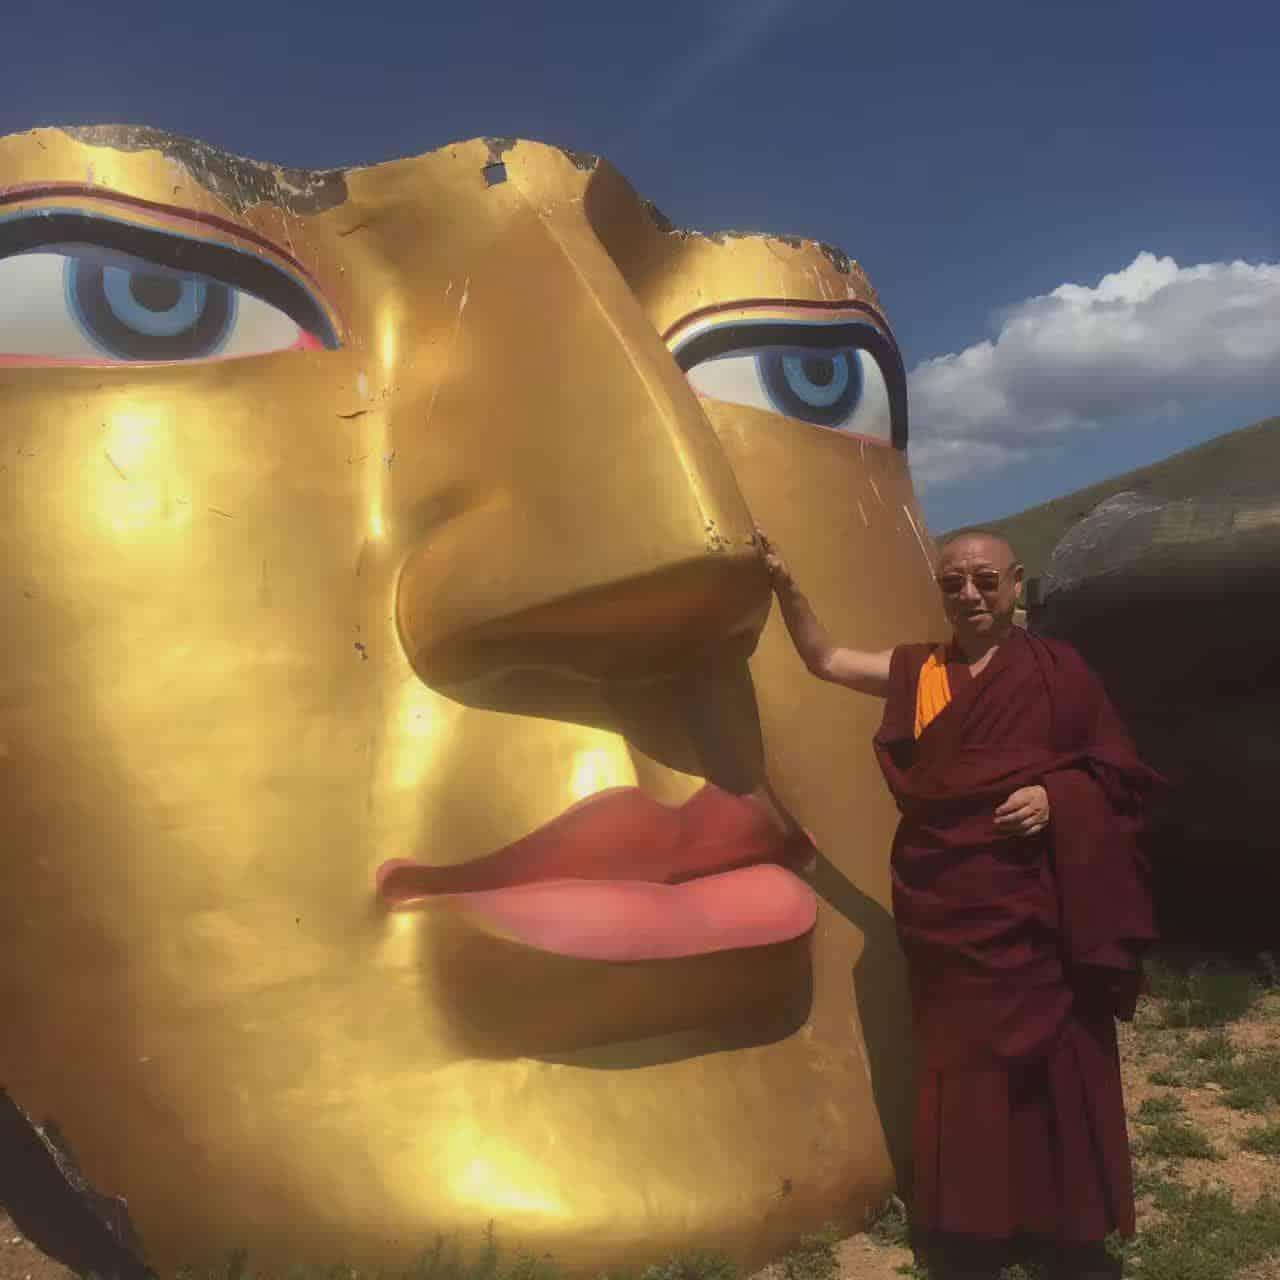 gosok-rinpoche-mongolia-2016-1591f708d0126365dcb9270c692c75c